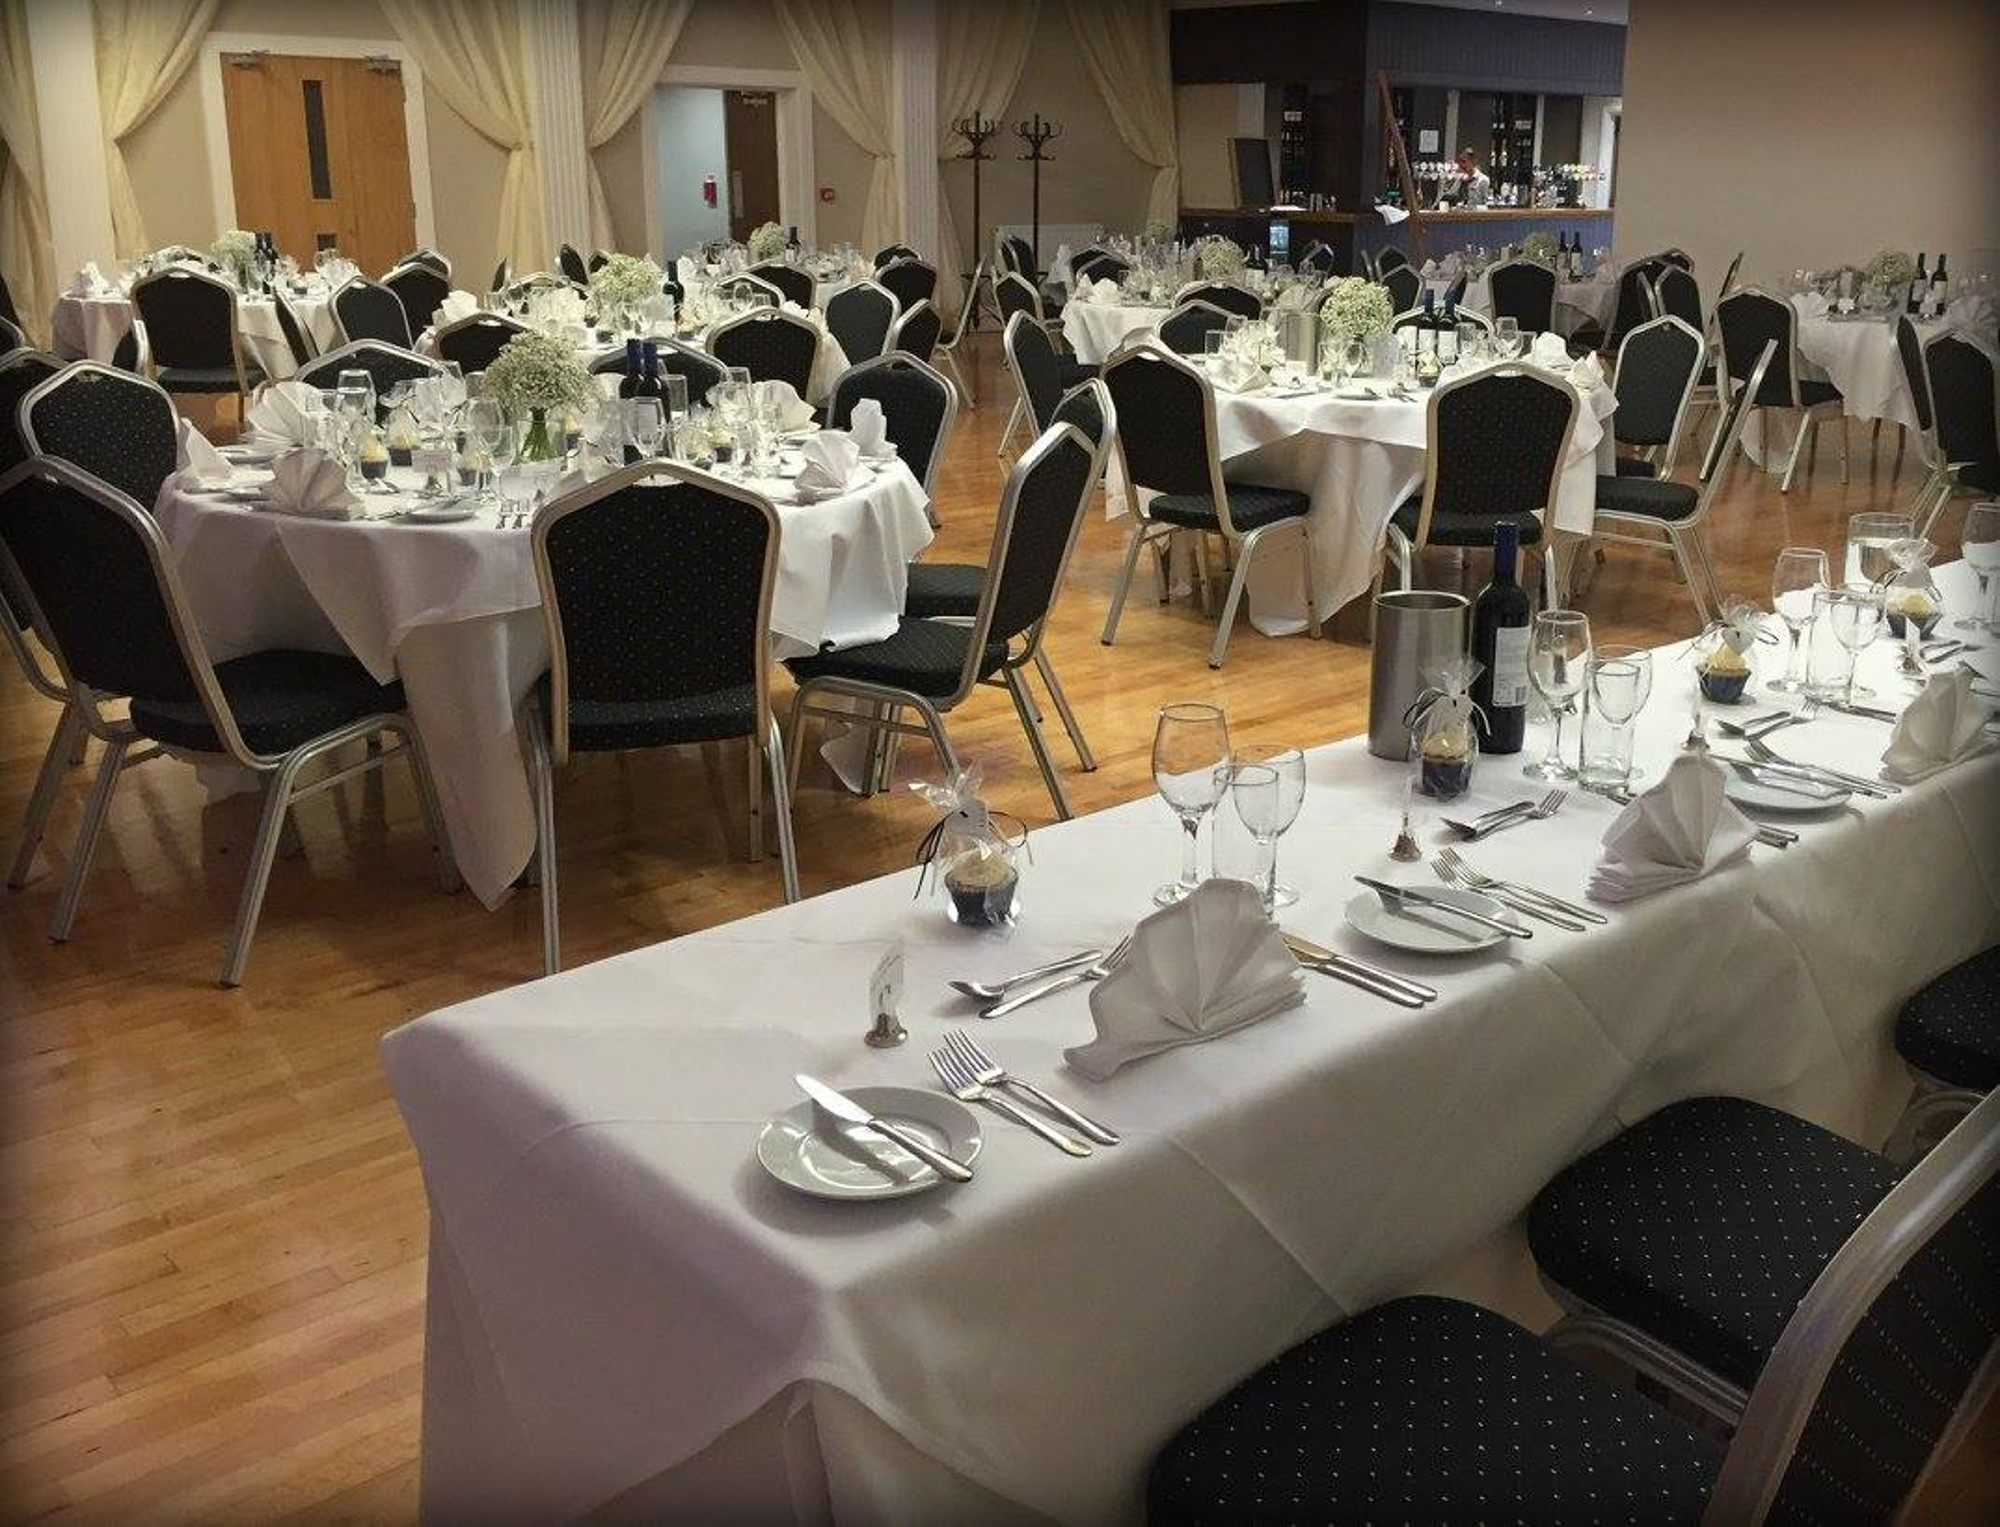 Wedding venues in Salisbury - The Stones Hotel